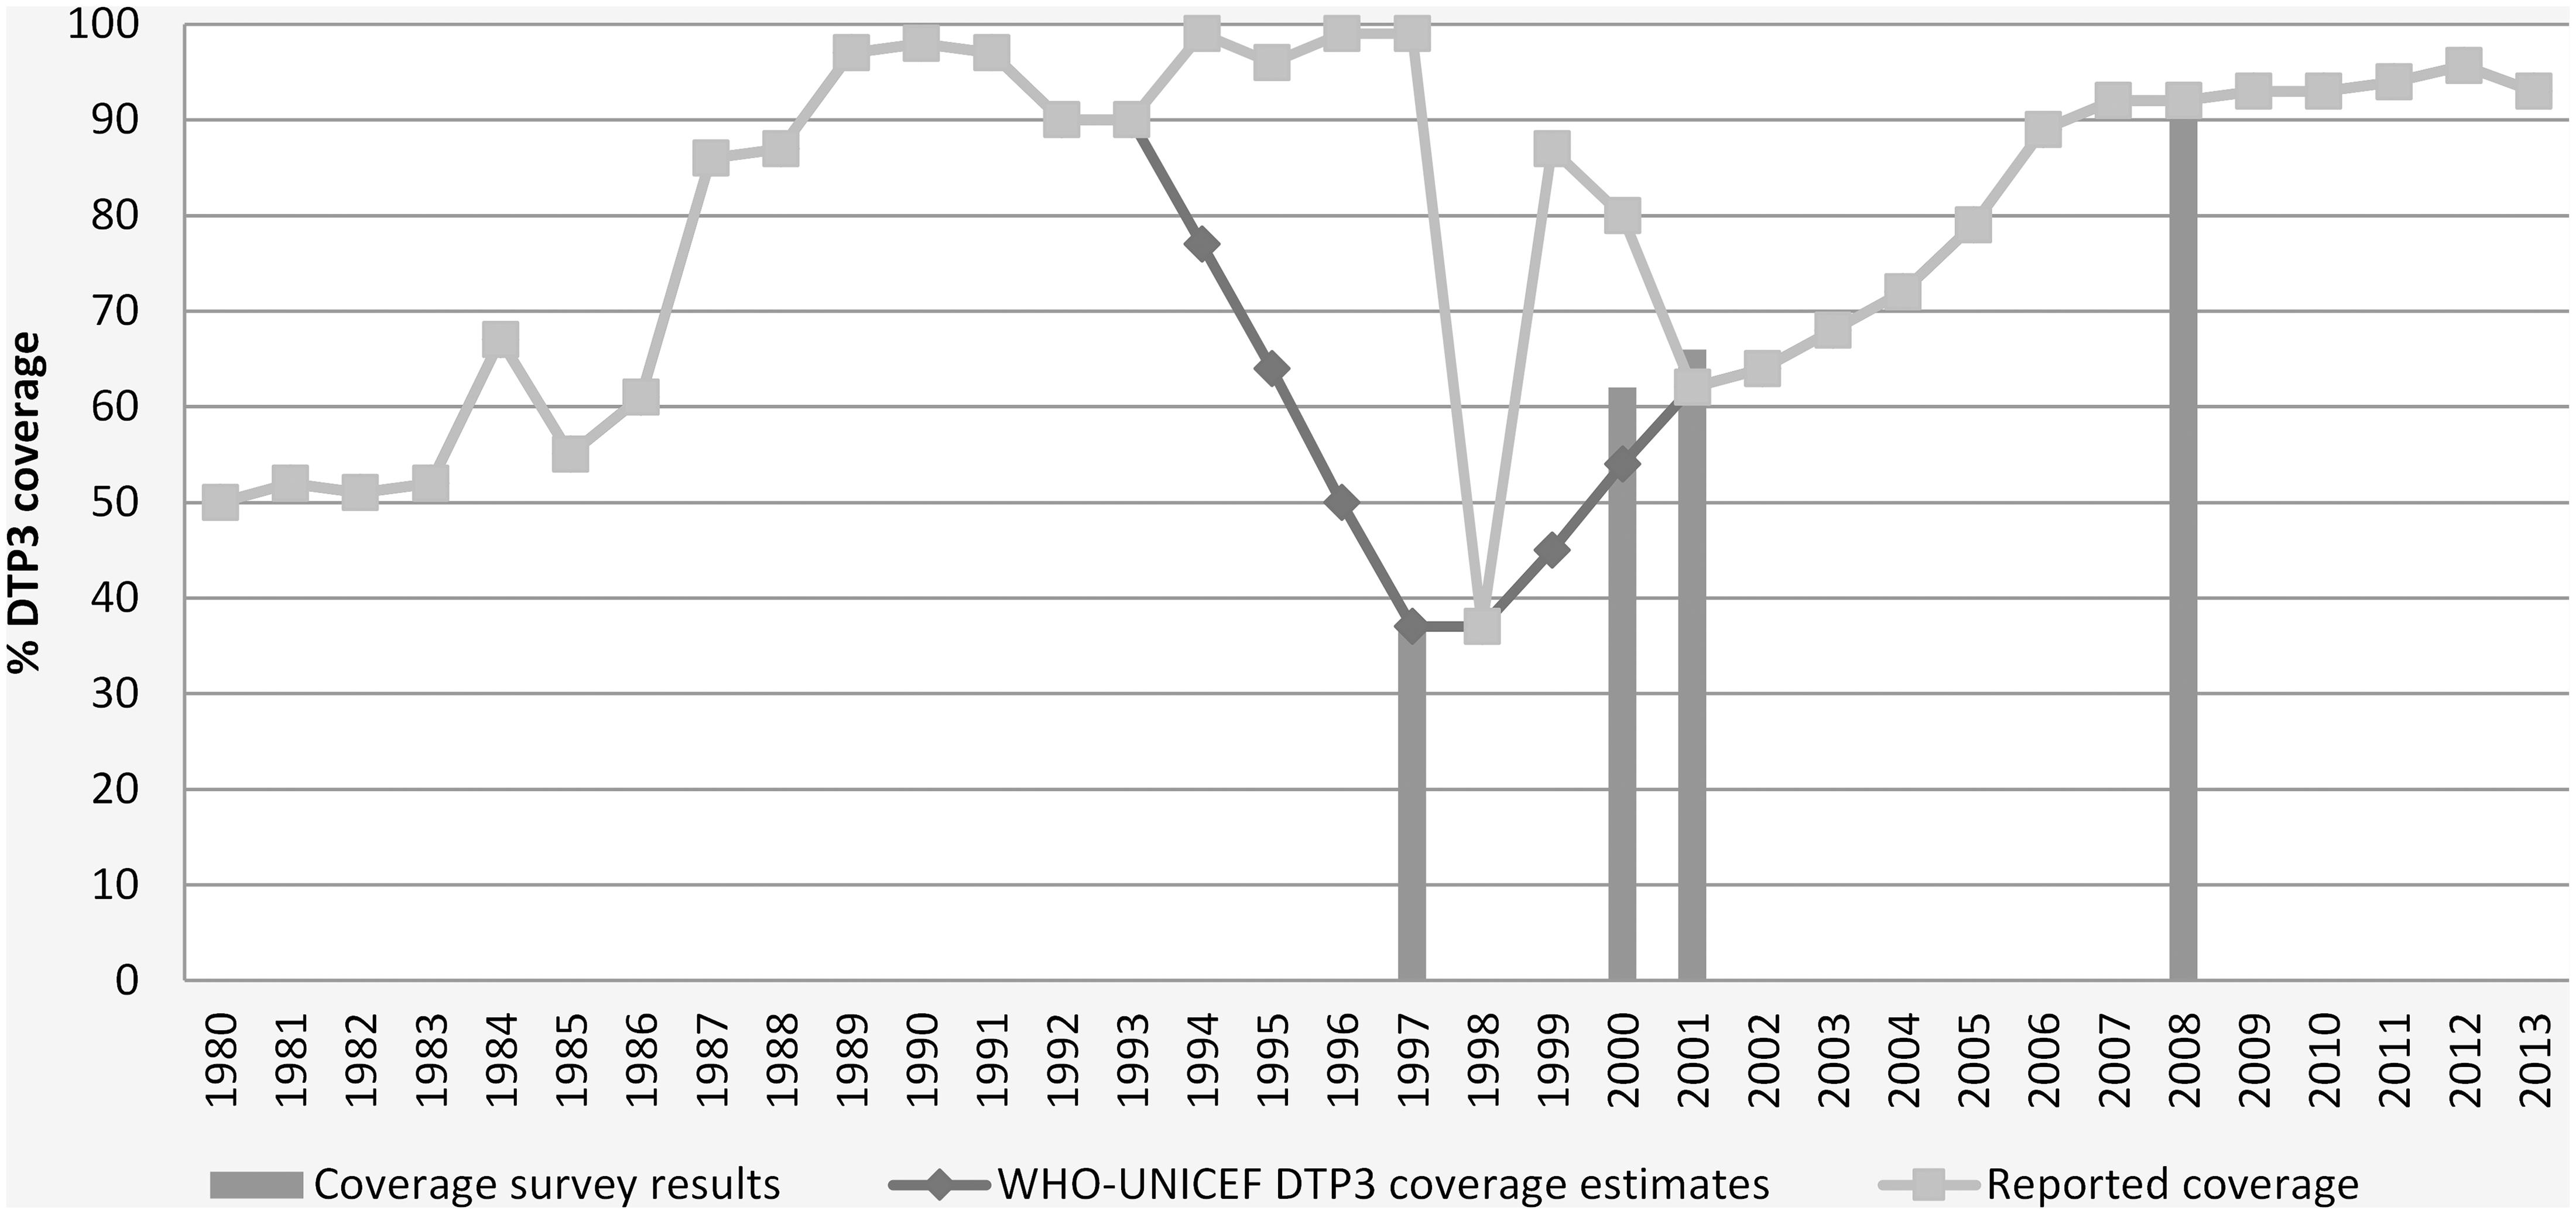 "WHO/UNICEF estimates of DTP3 coverage in DPRK, 1980–2013 [<em class=""ref"">34</em>]."